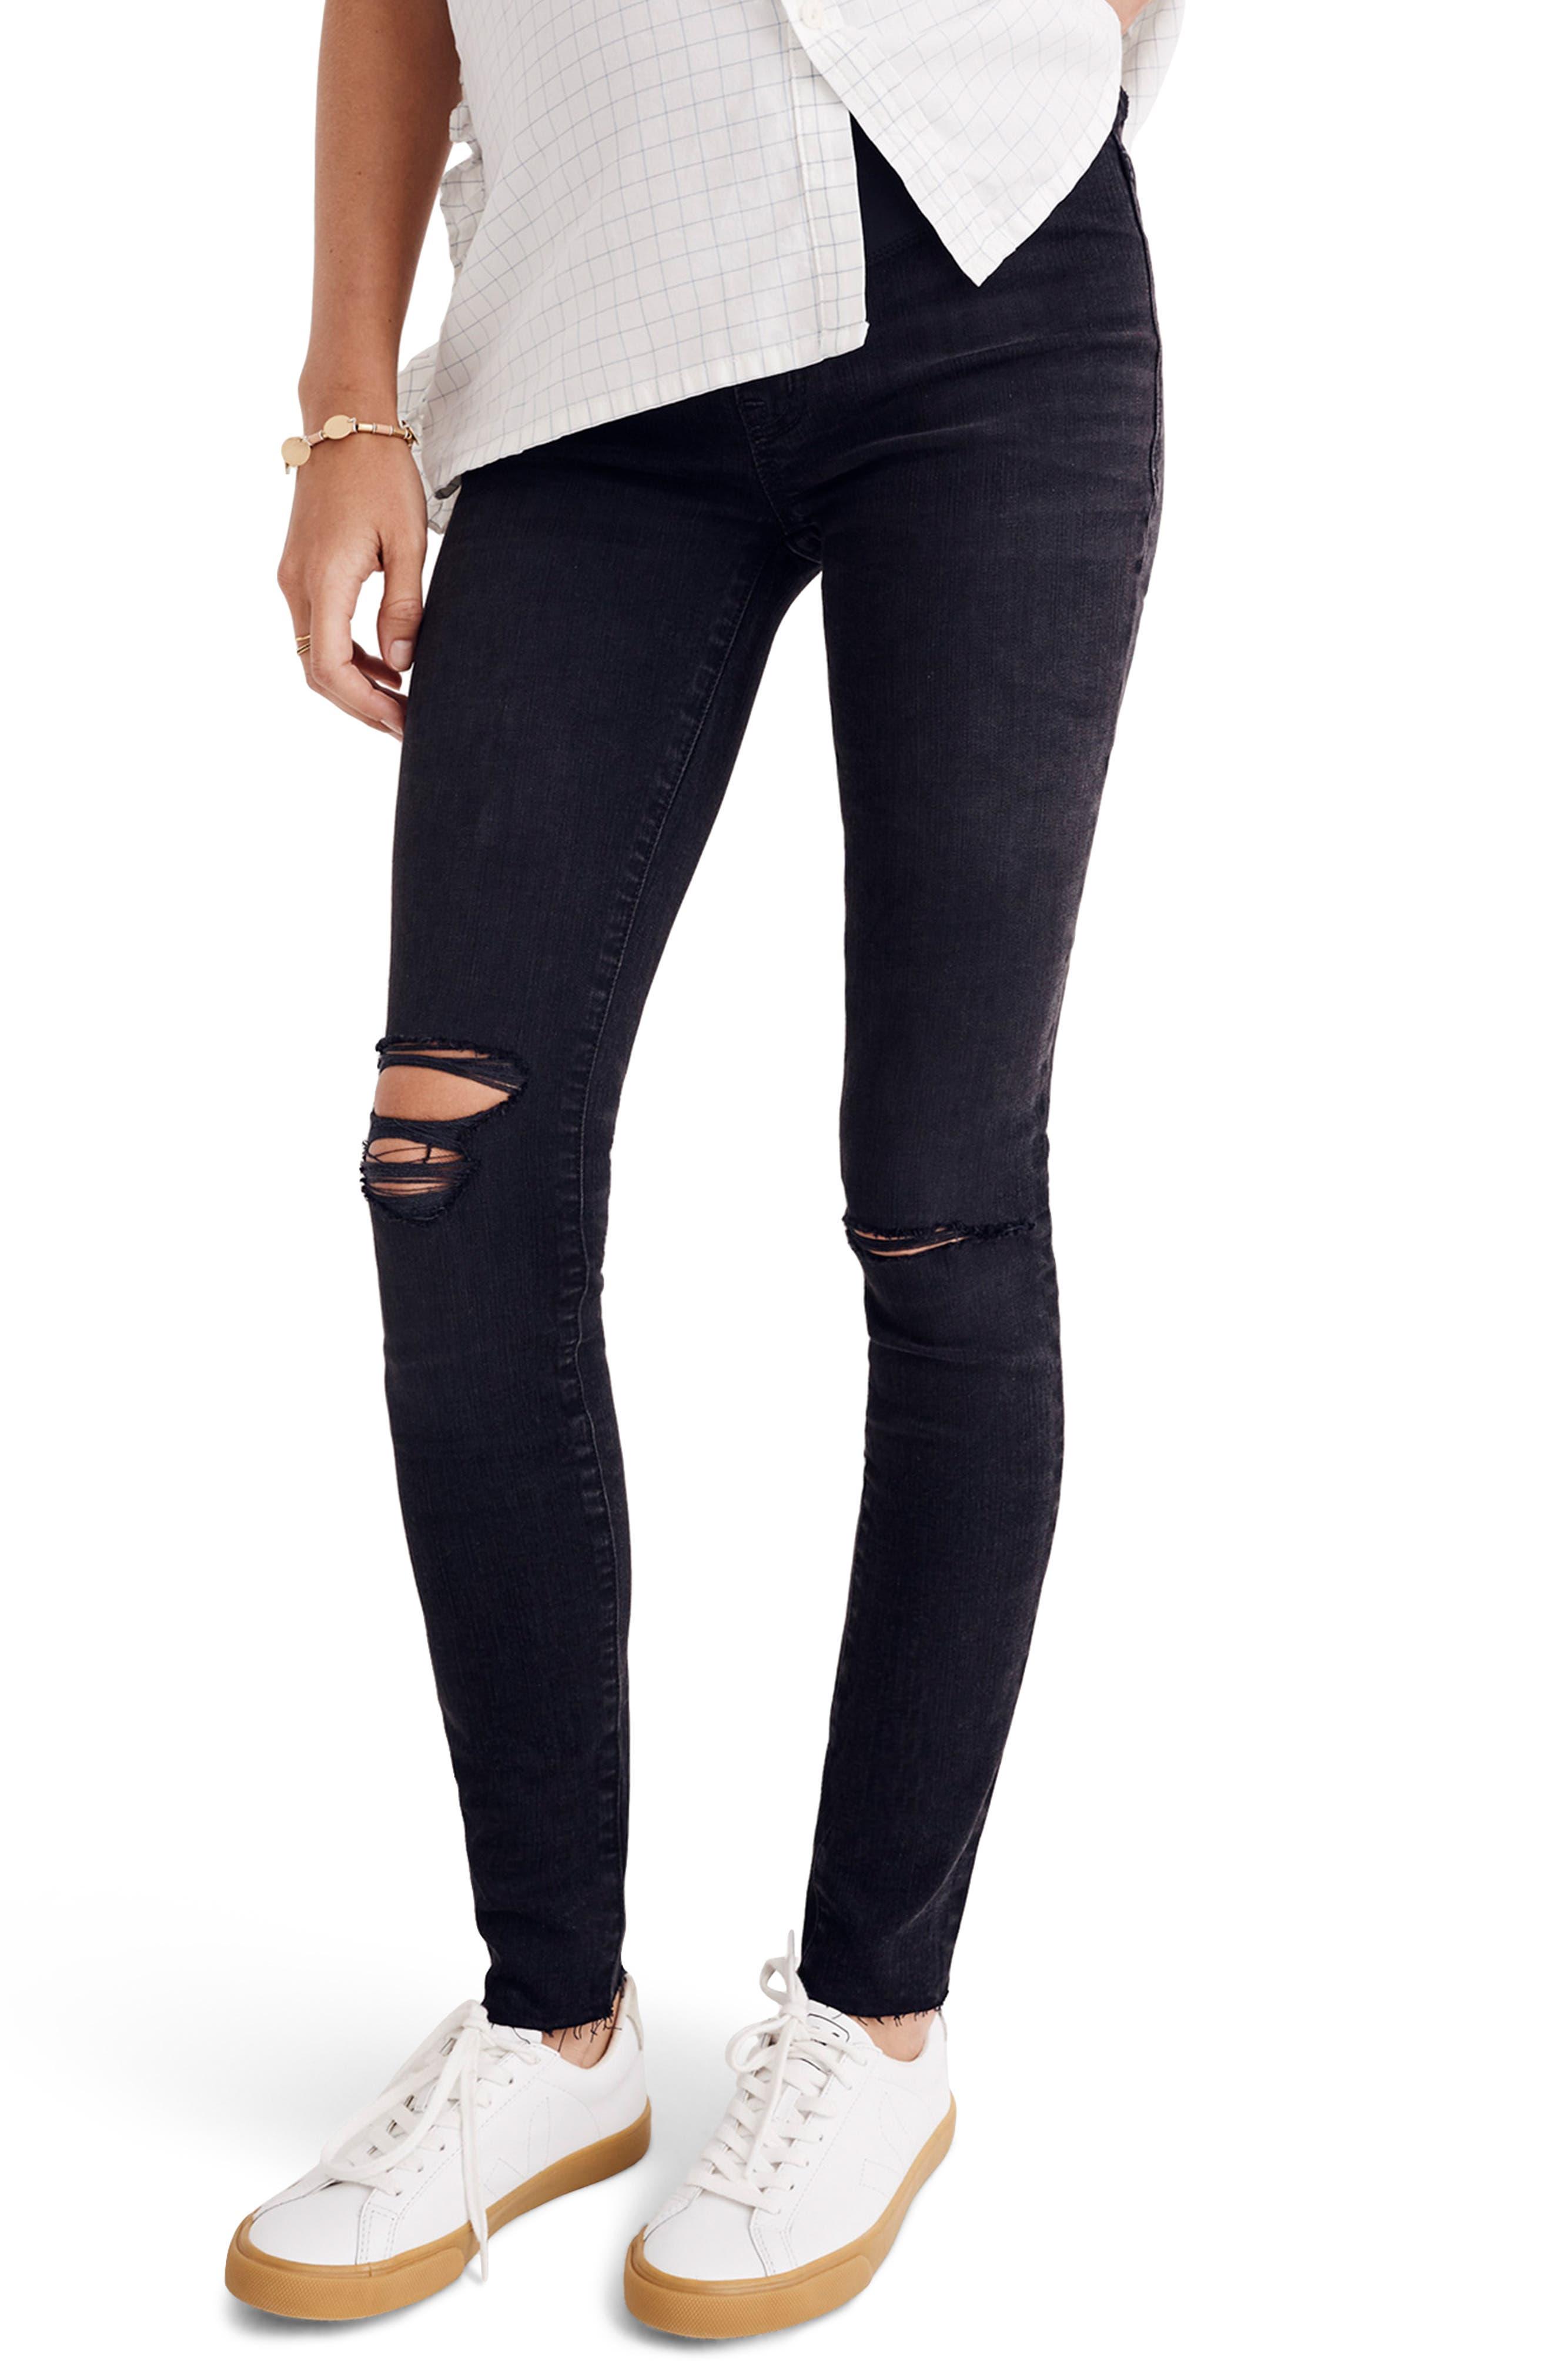 Maternity Skinny Jeans,                             Main thumbnail 1, color,                             009